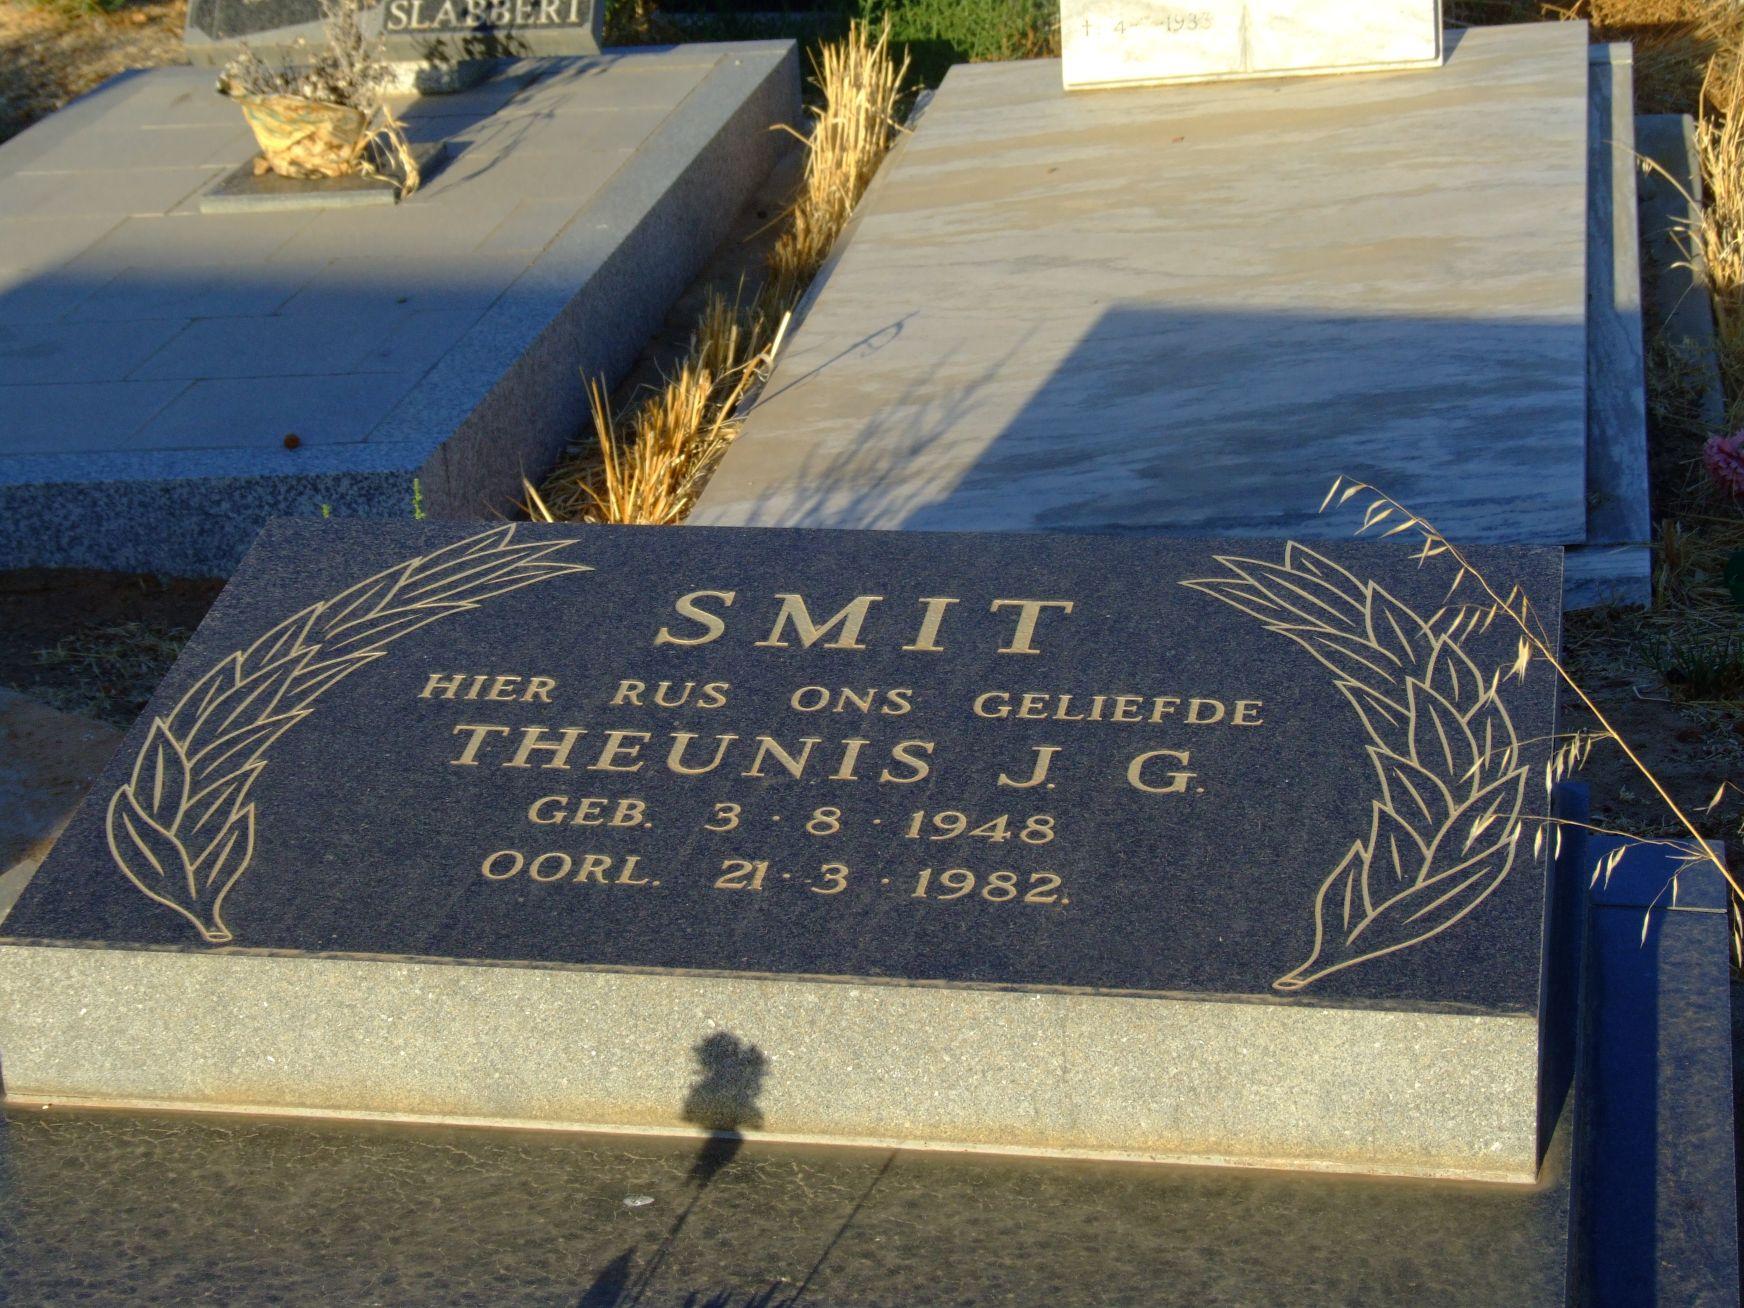 Smit, Theunis J. G.